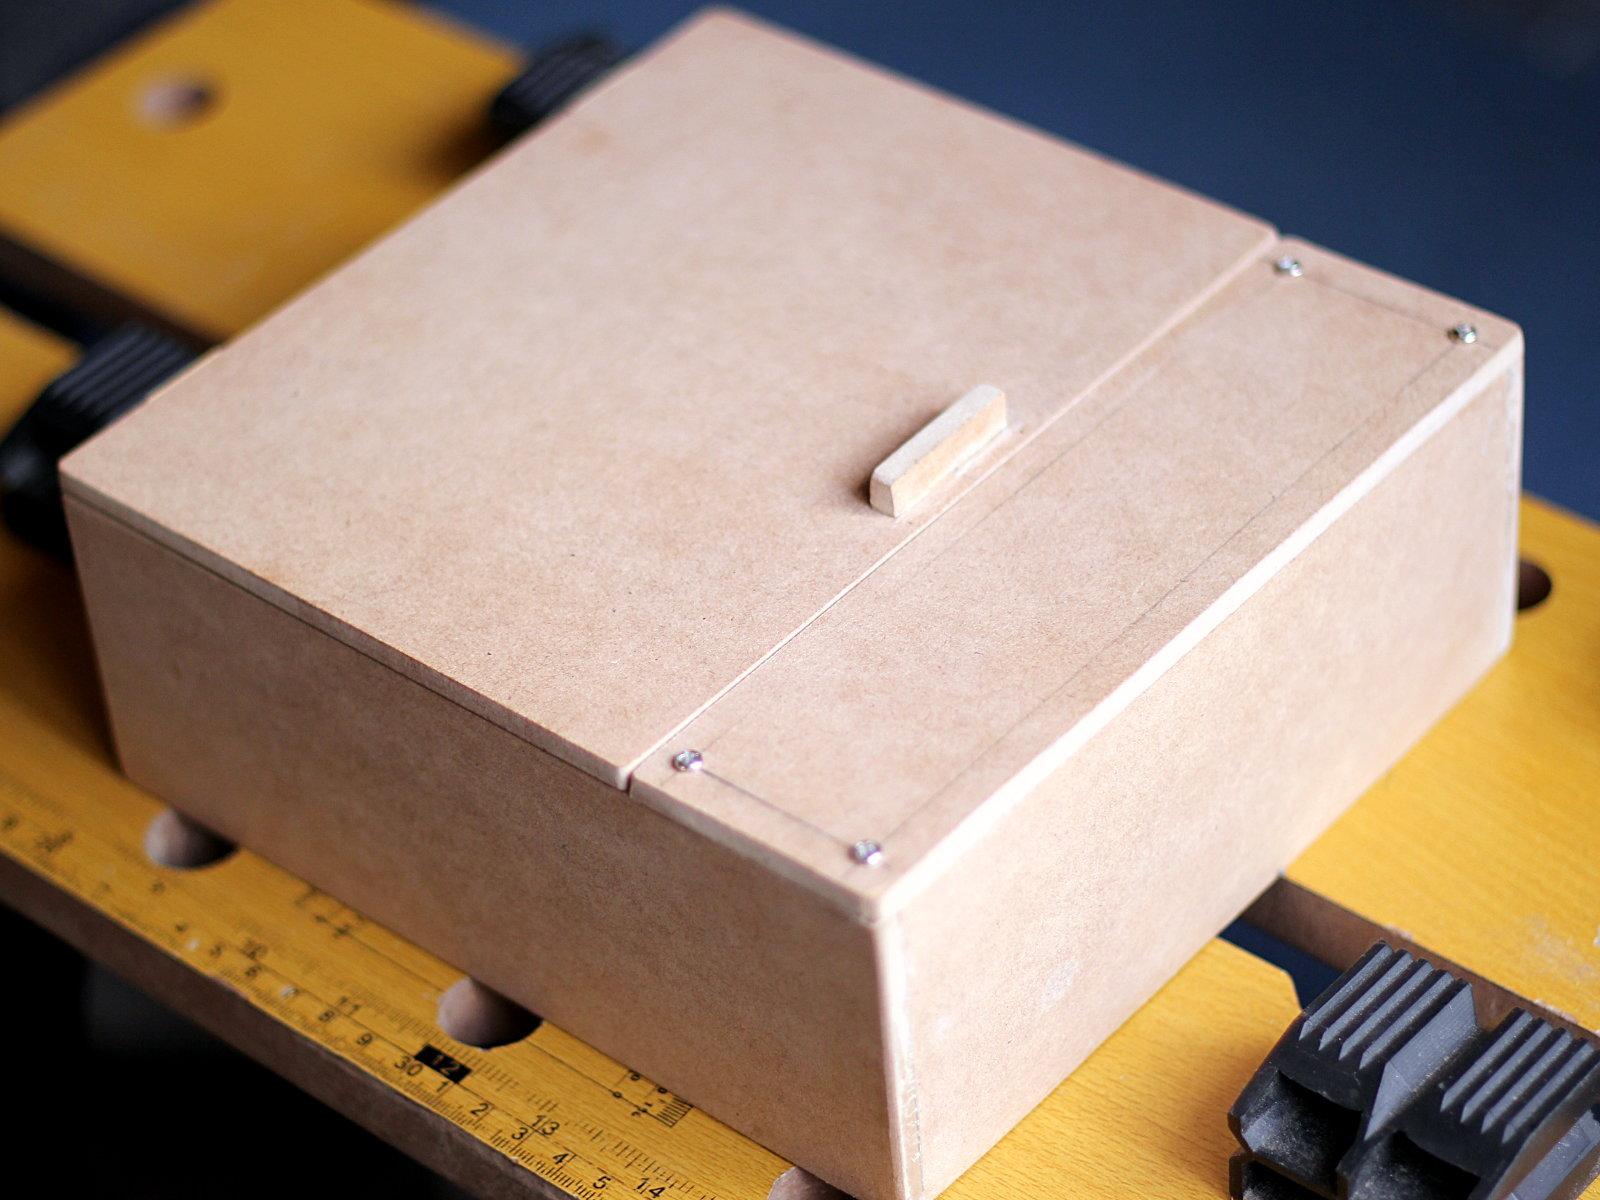 UV Exposure Box Project – Part 1